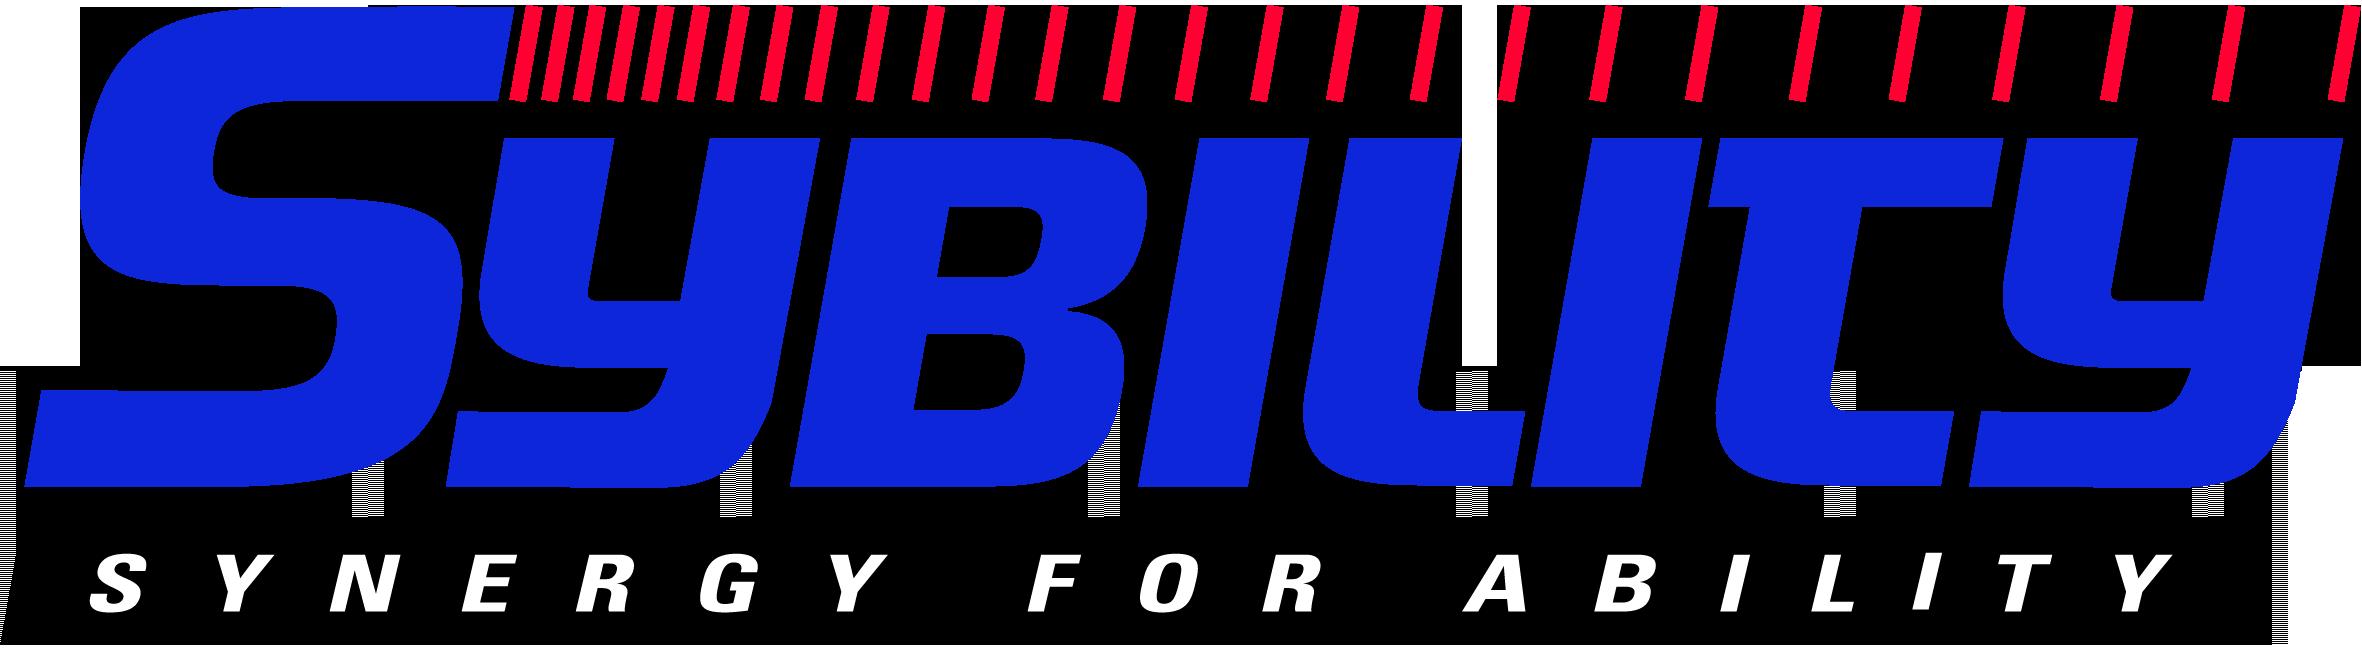 SYBILITY Logo